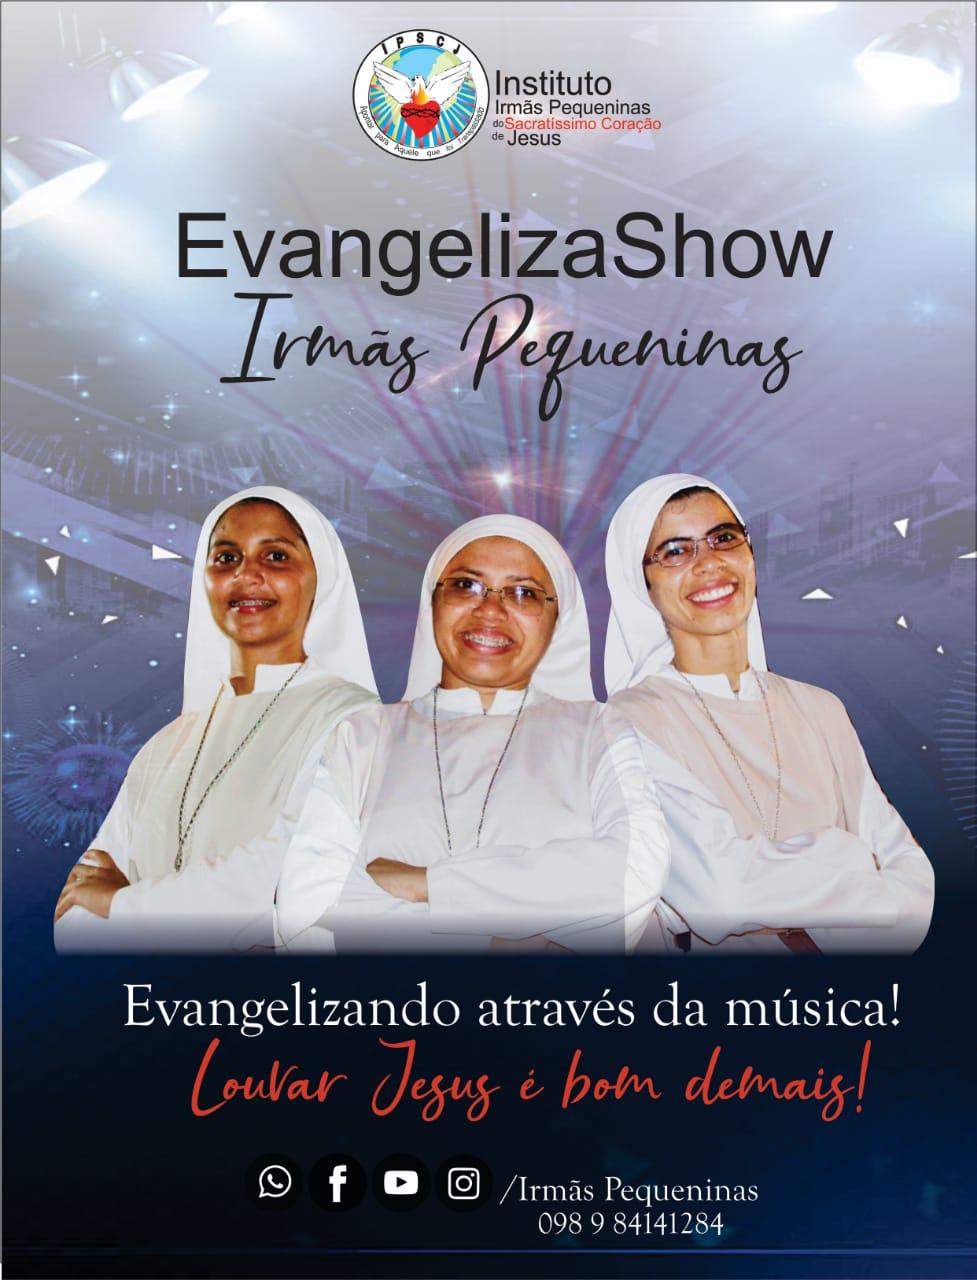 EvangelizaShow das Irmãs Pequeninas